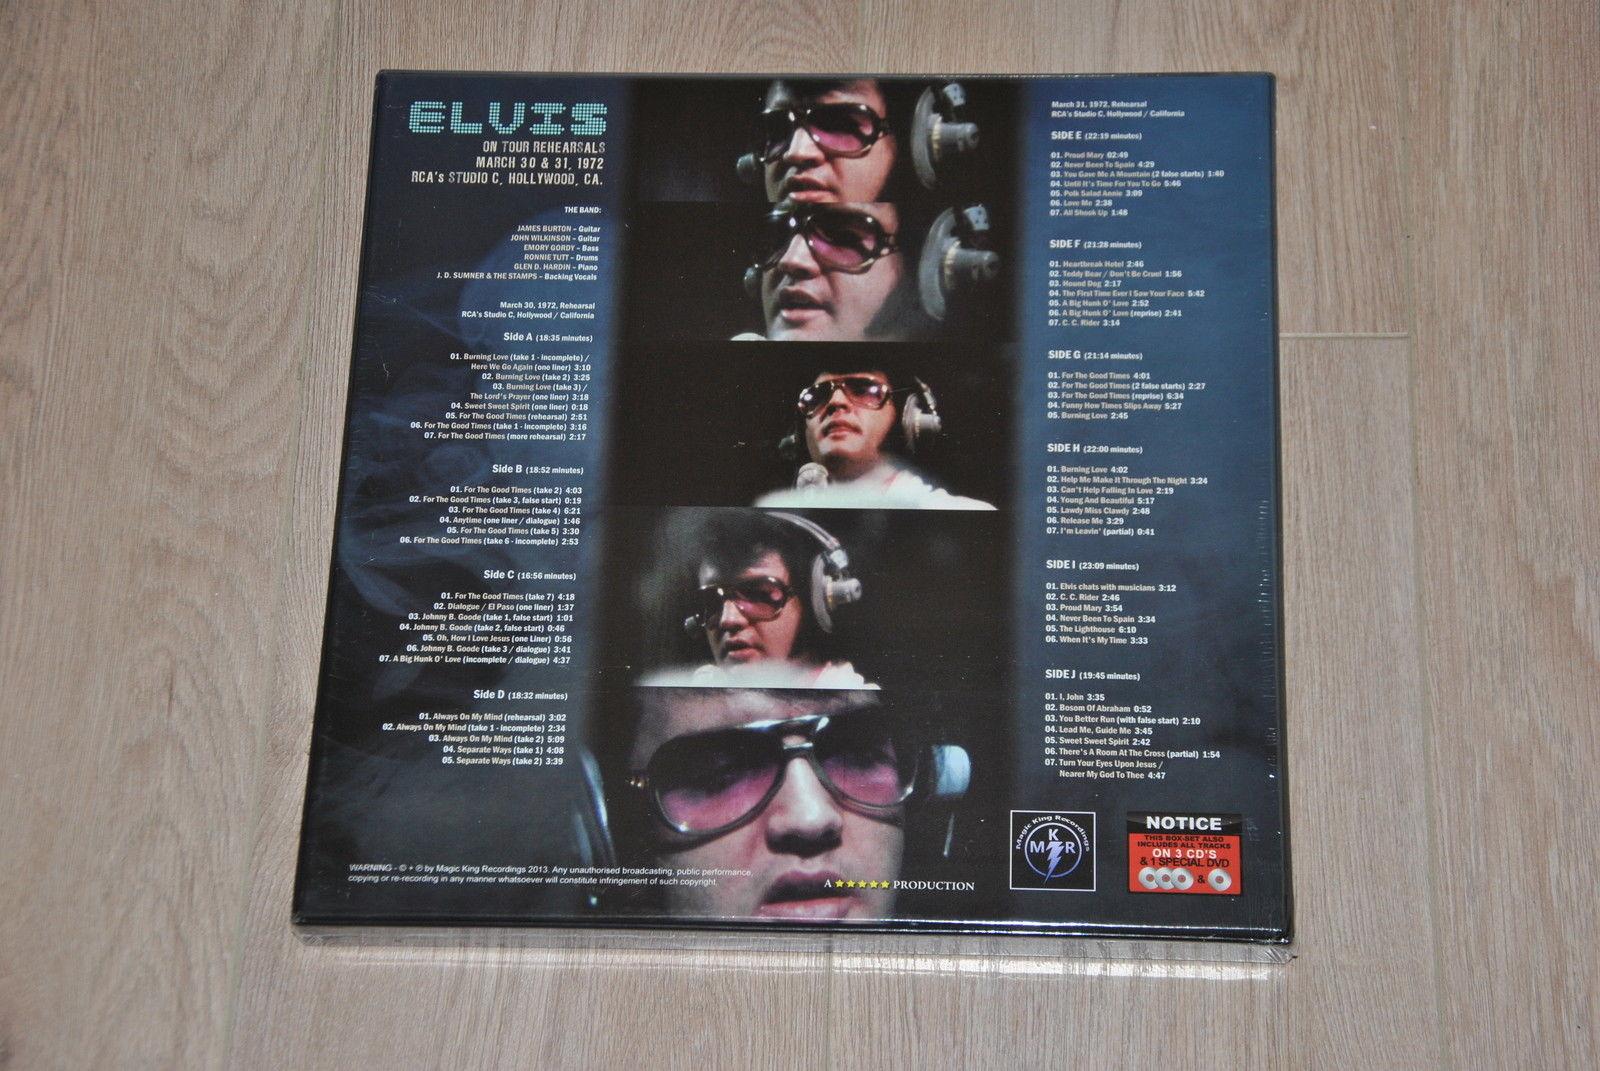 Elvis On Tour Rehearsals: 1972 Ontourb5ap3y